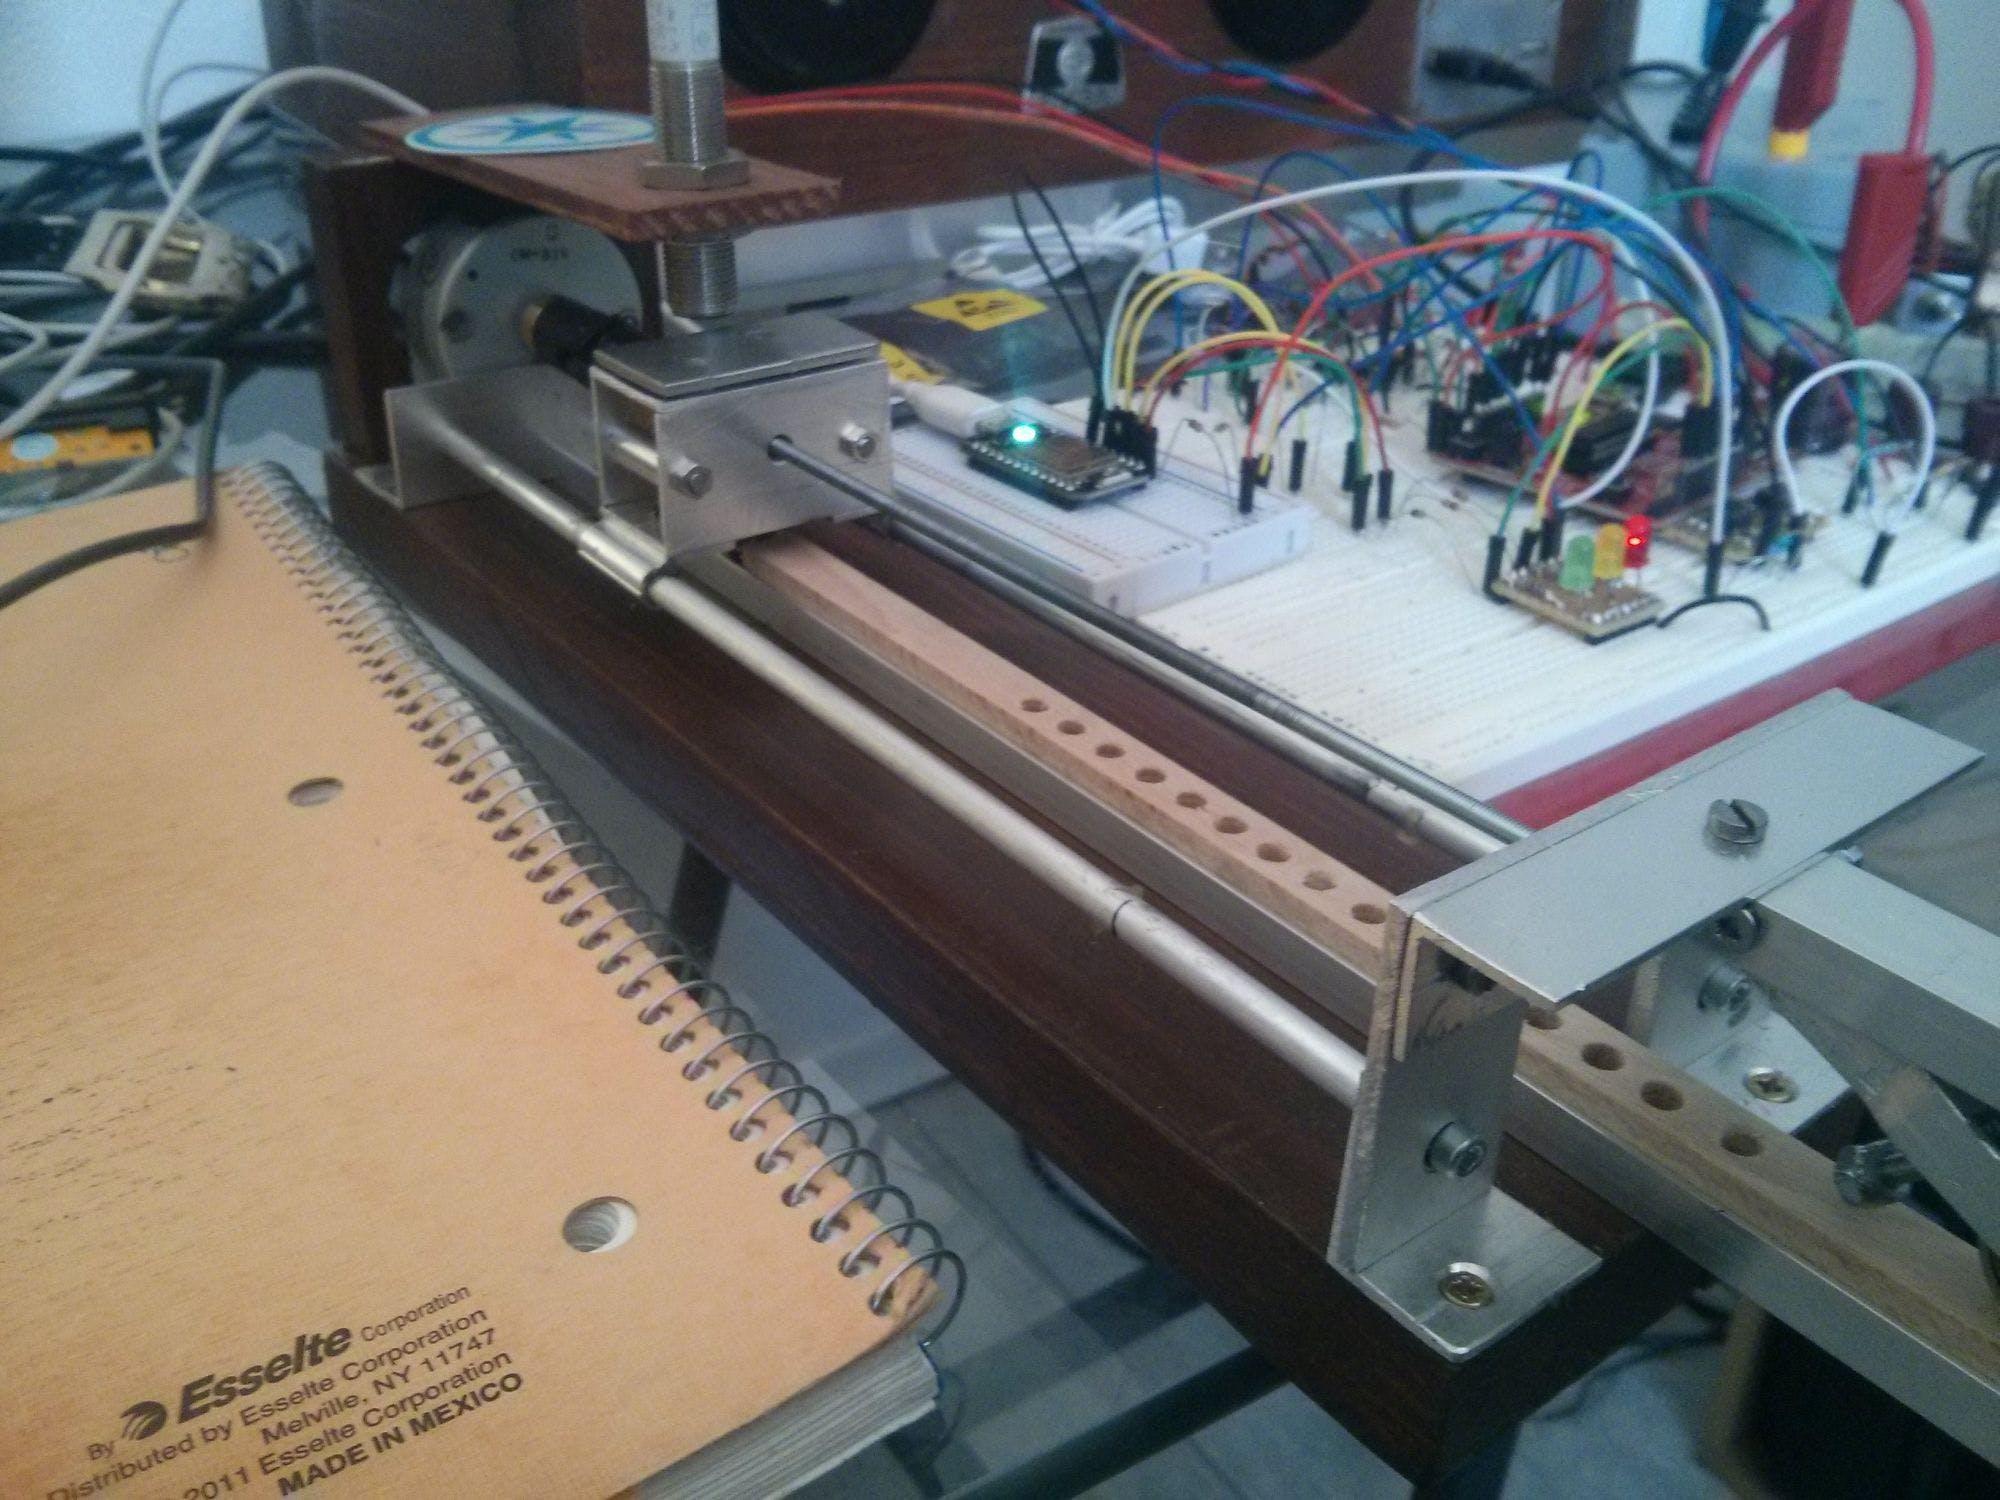 Working mechanics and circuit